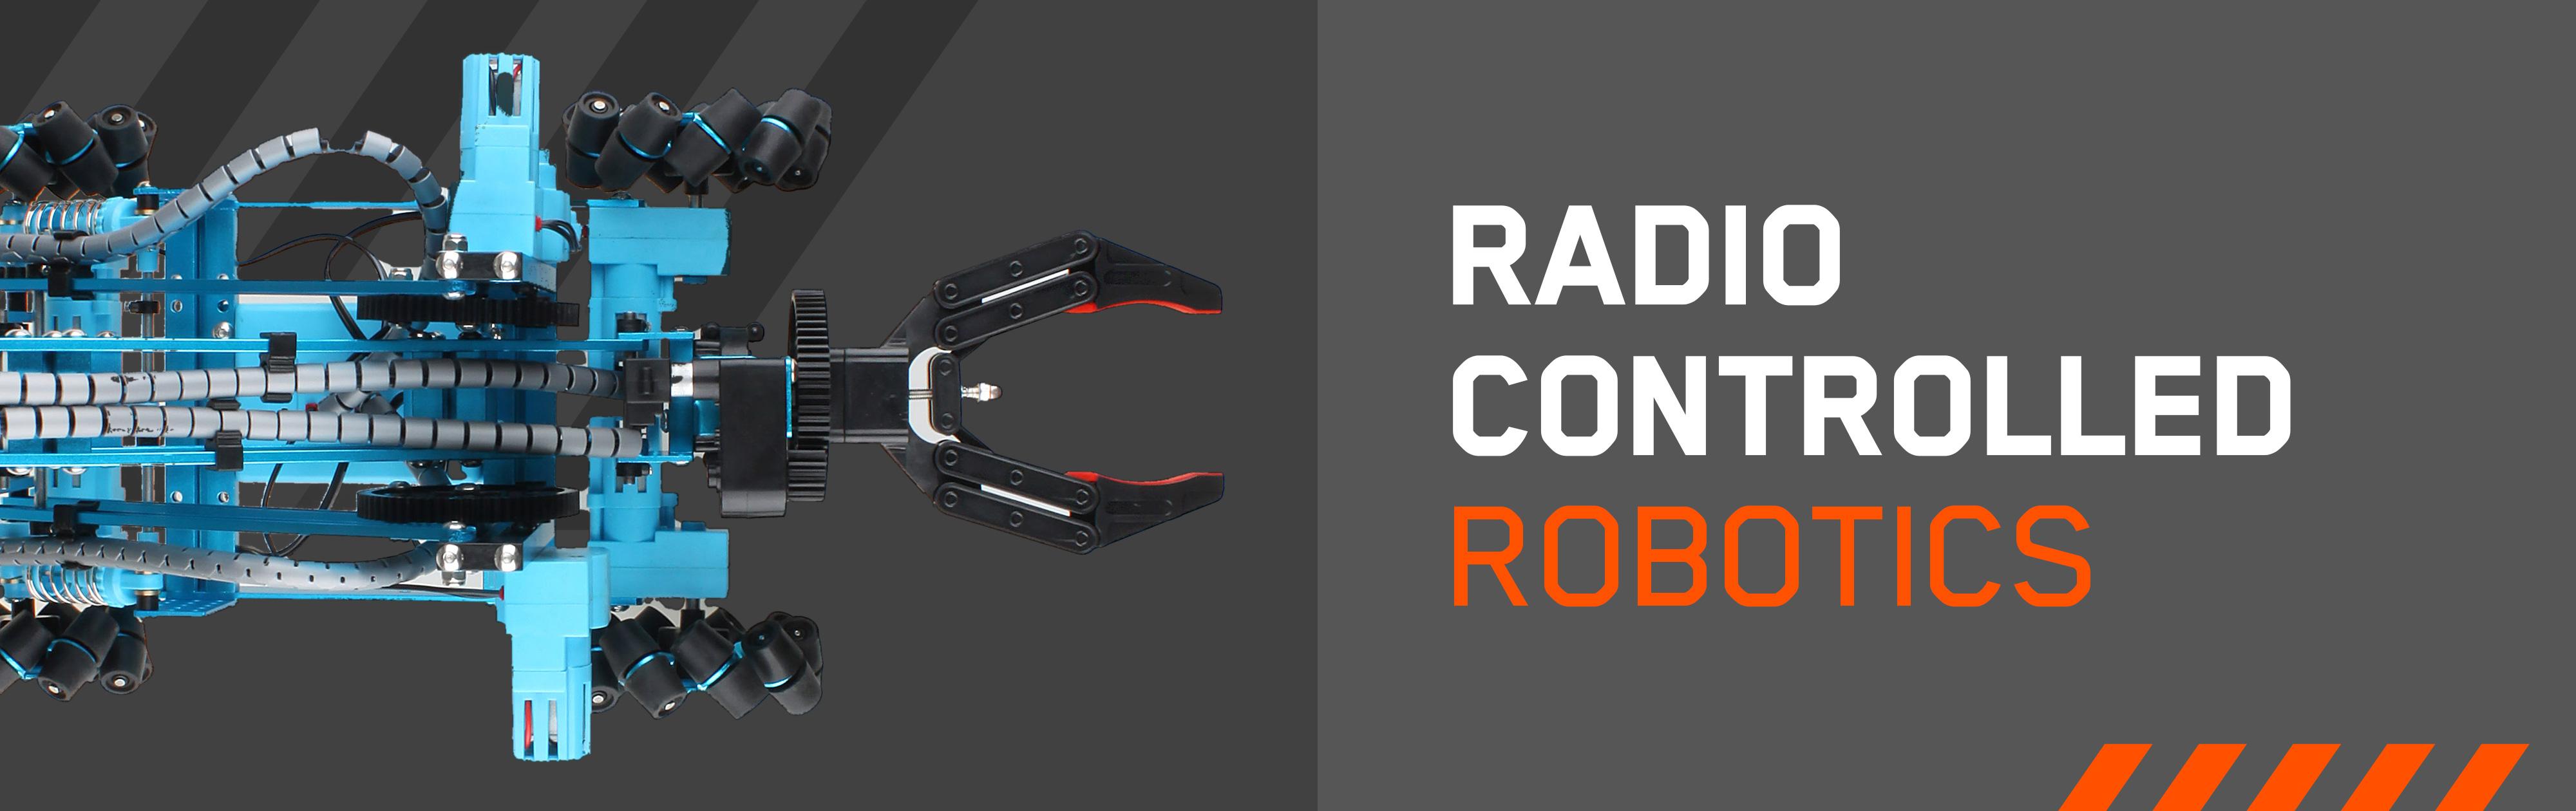 Modster-Robotics-kaufen